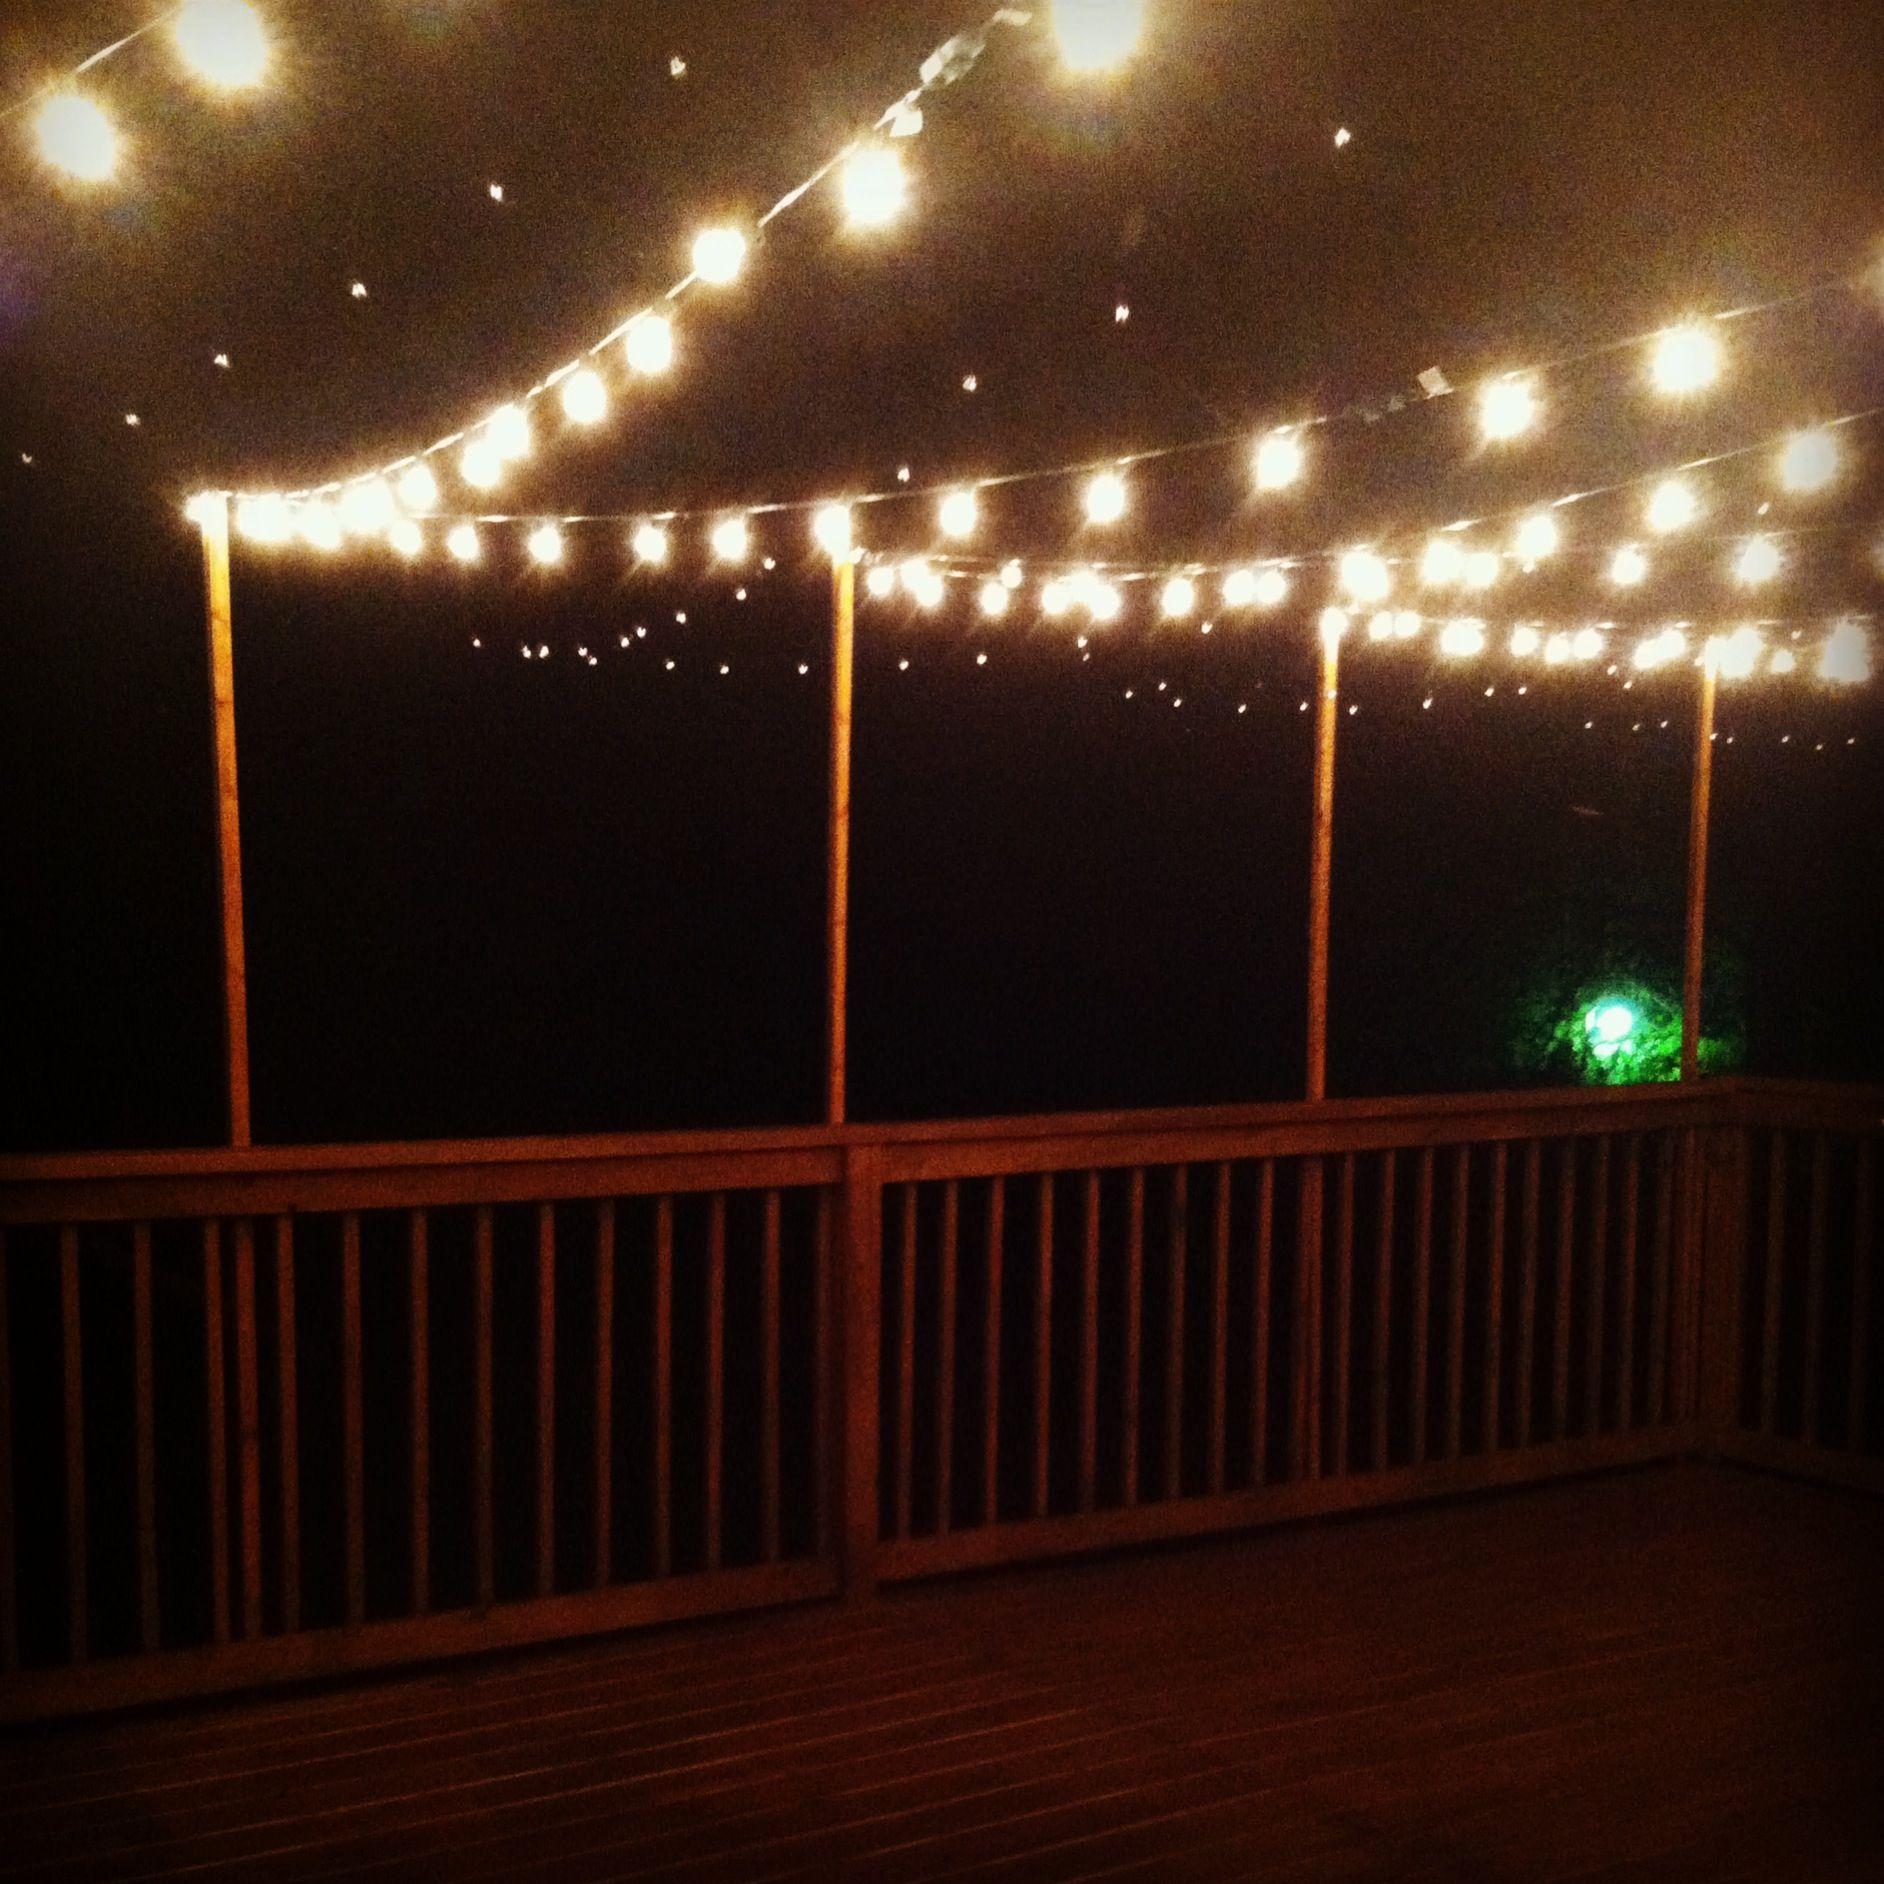 Outdoor Lights String Outdoor Deck String Lights Diy  Shared Ideas  Pinterest  Decking